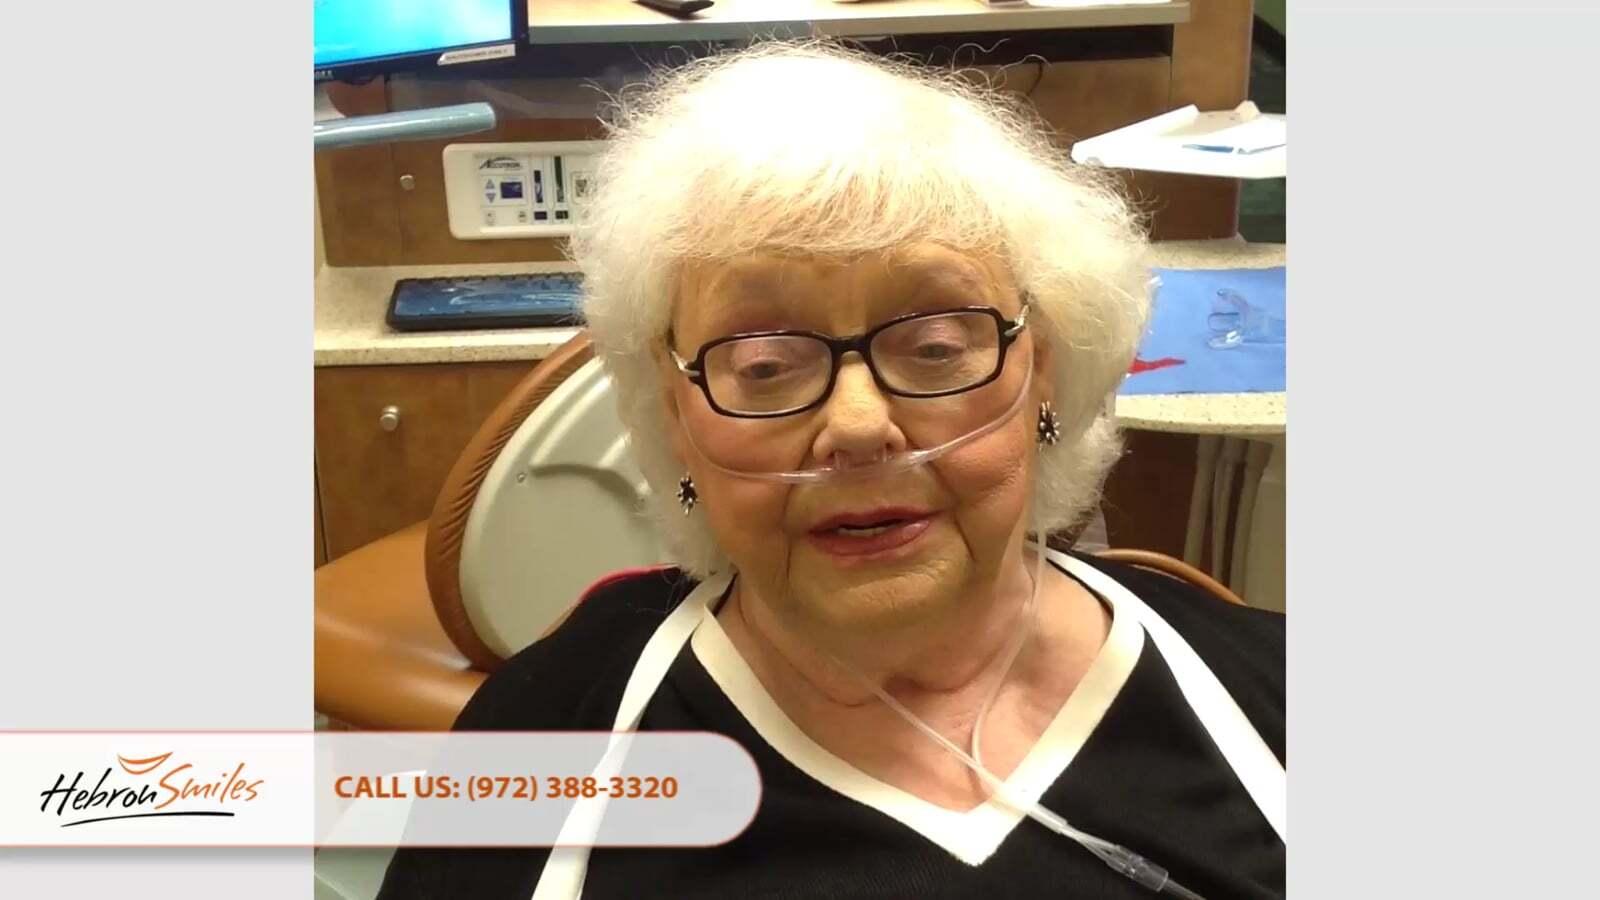 Testimonial Video 2